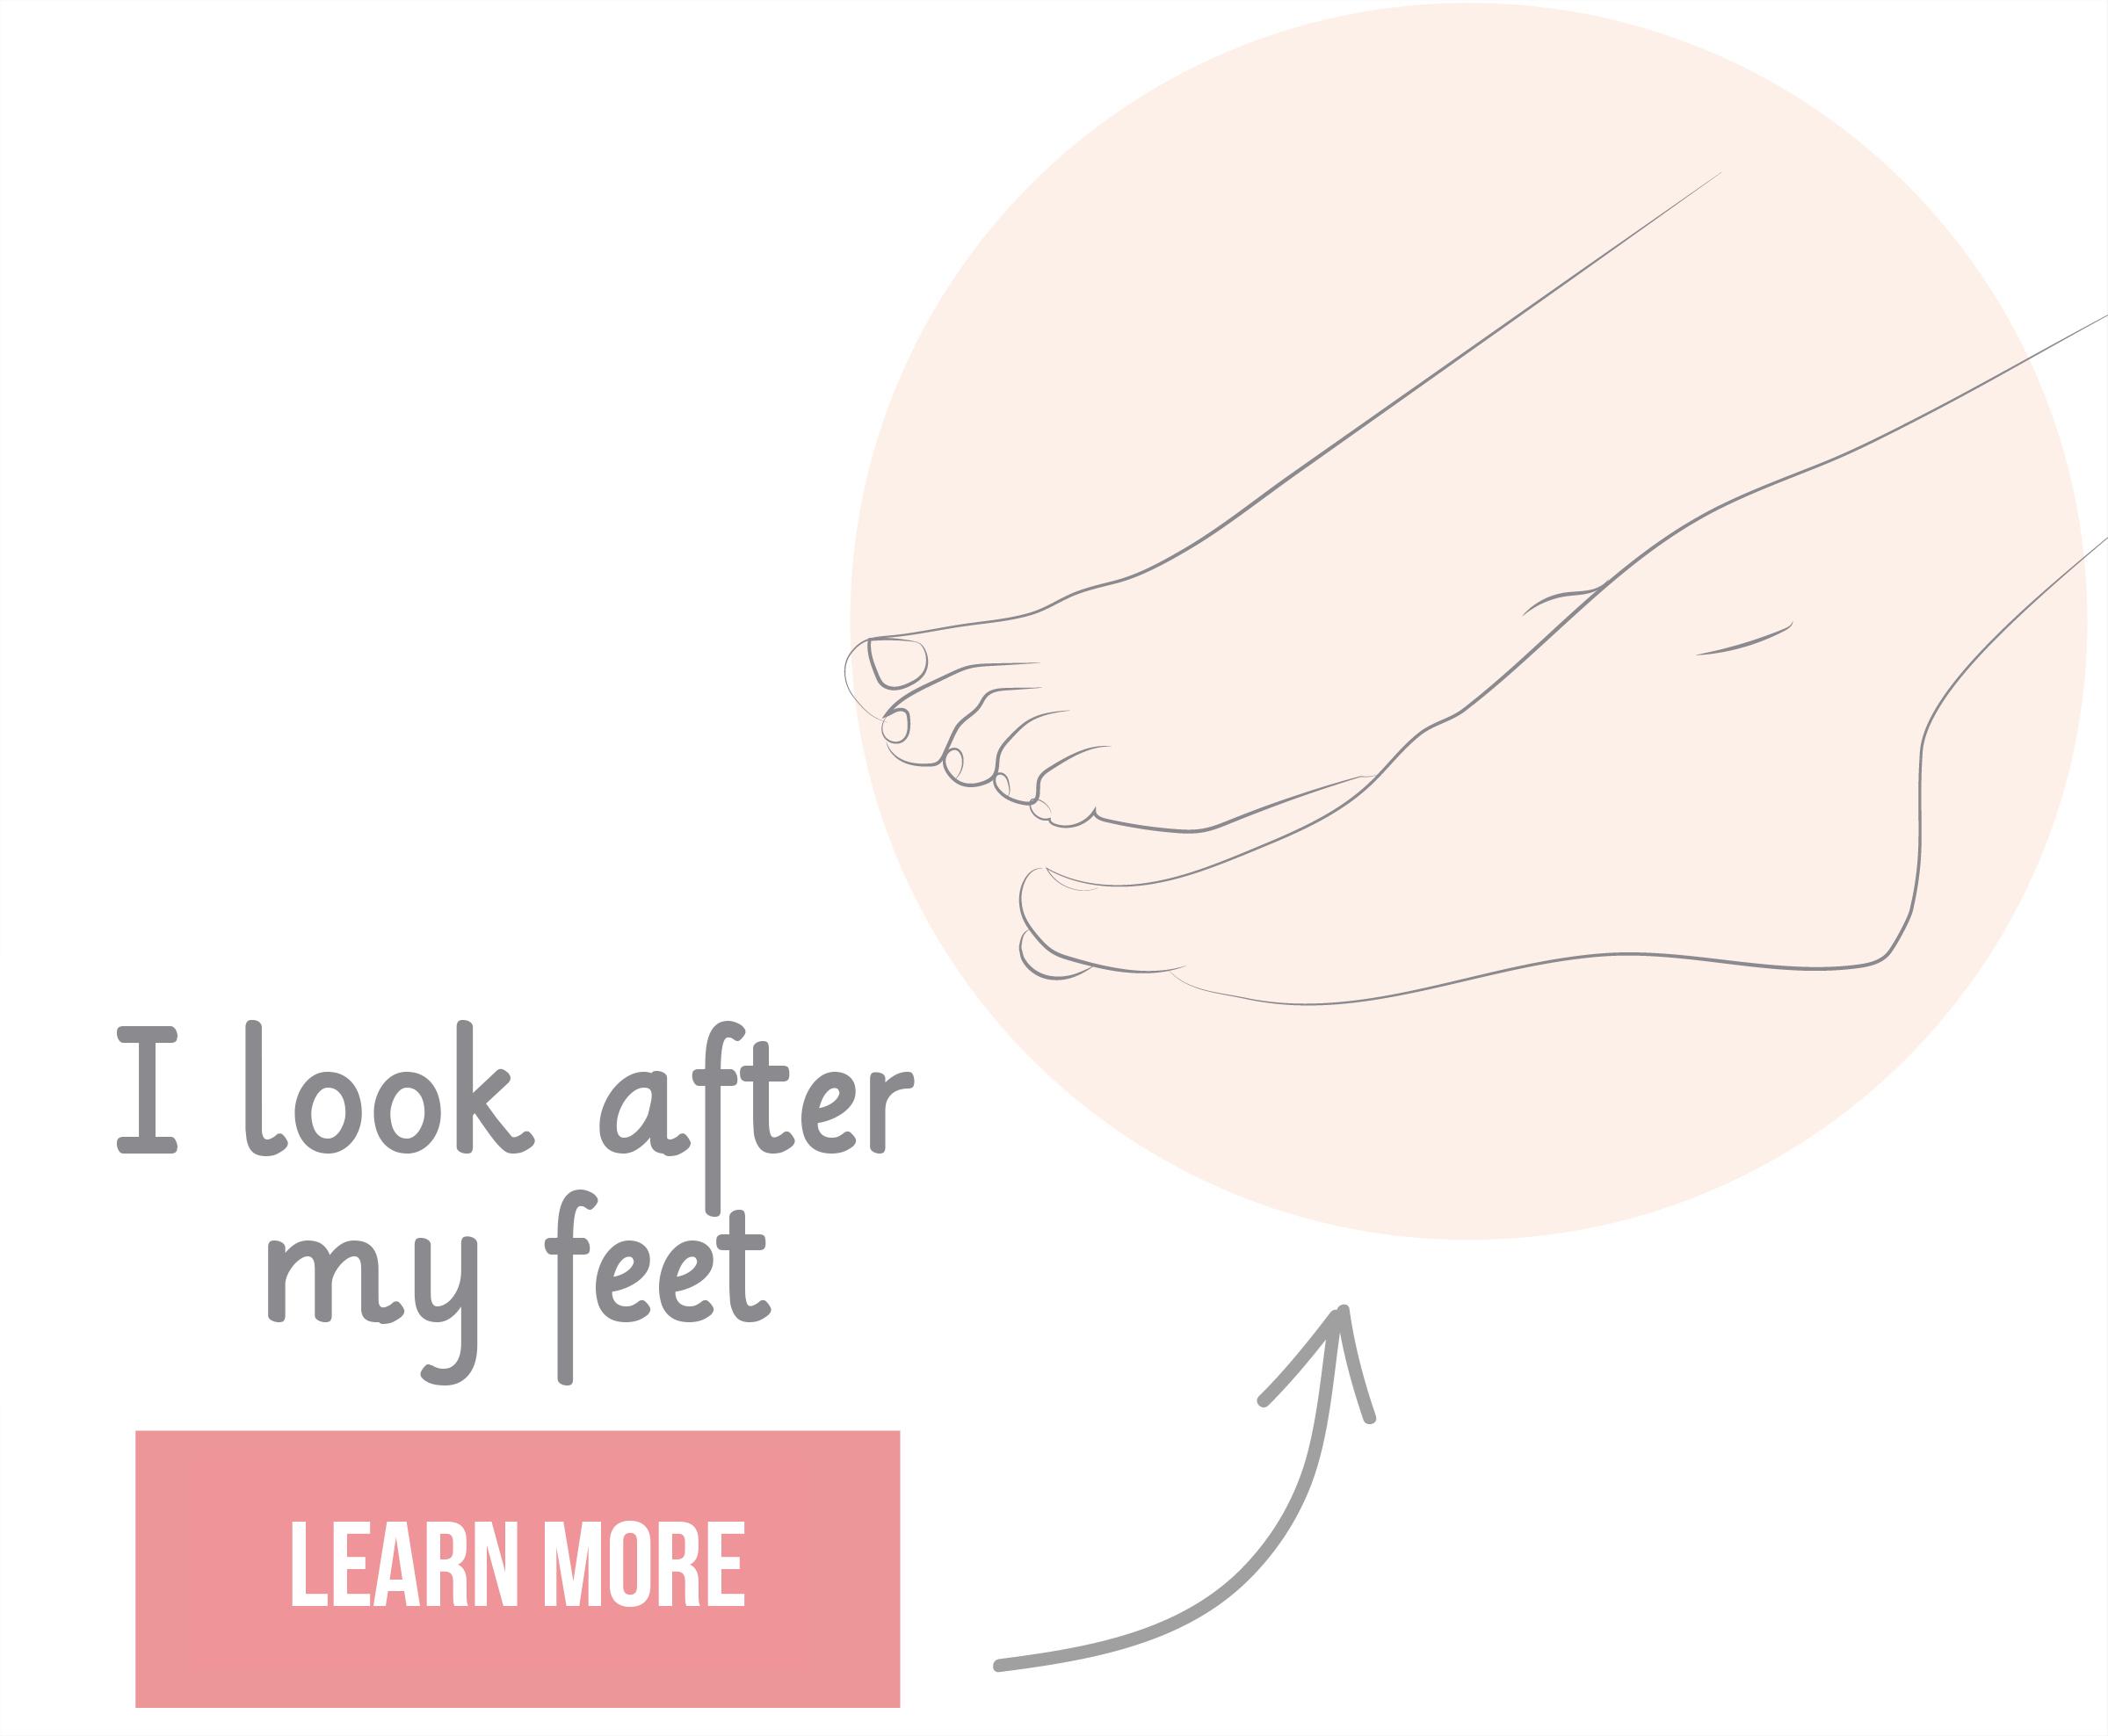 Je prends soin de mes pieds